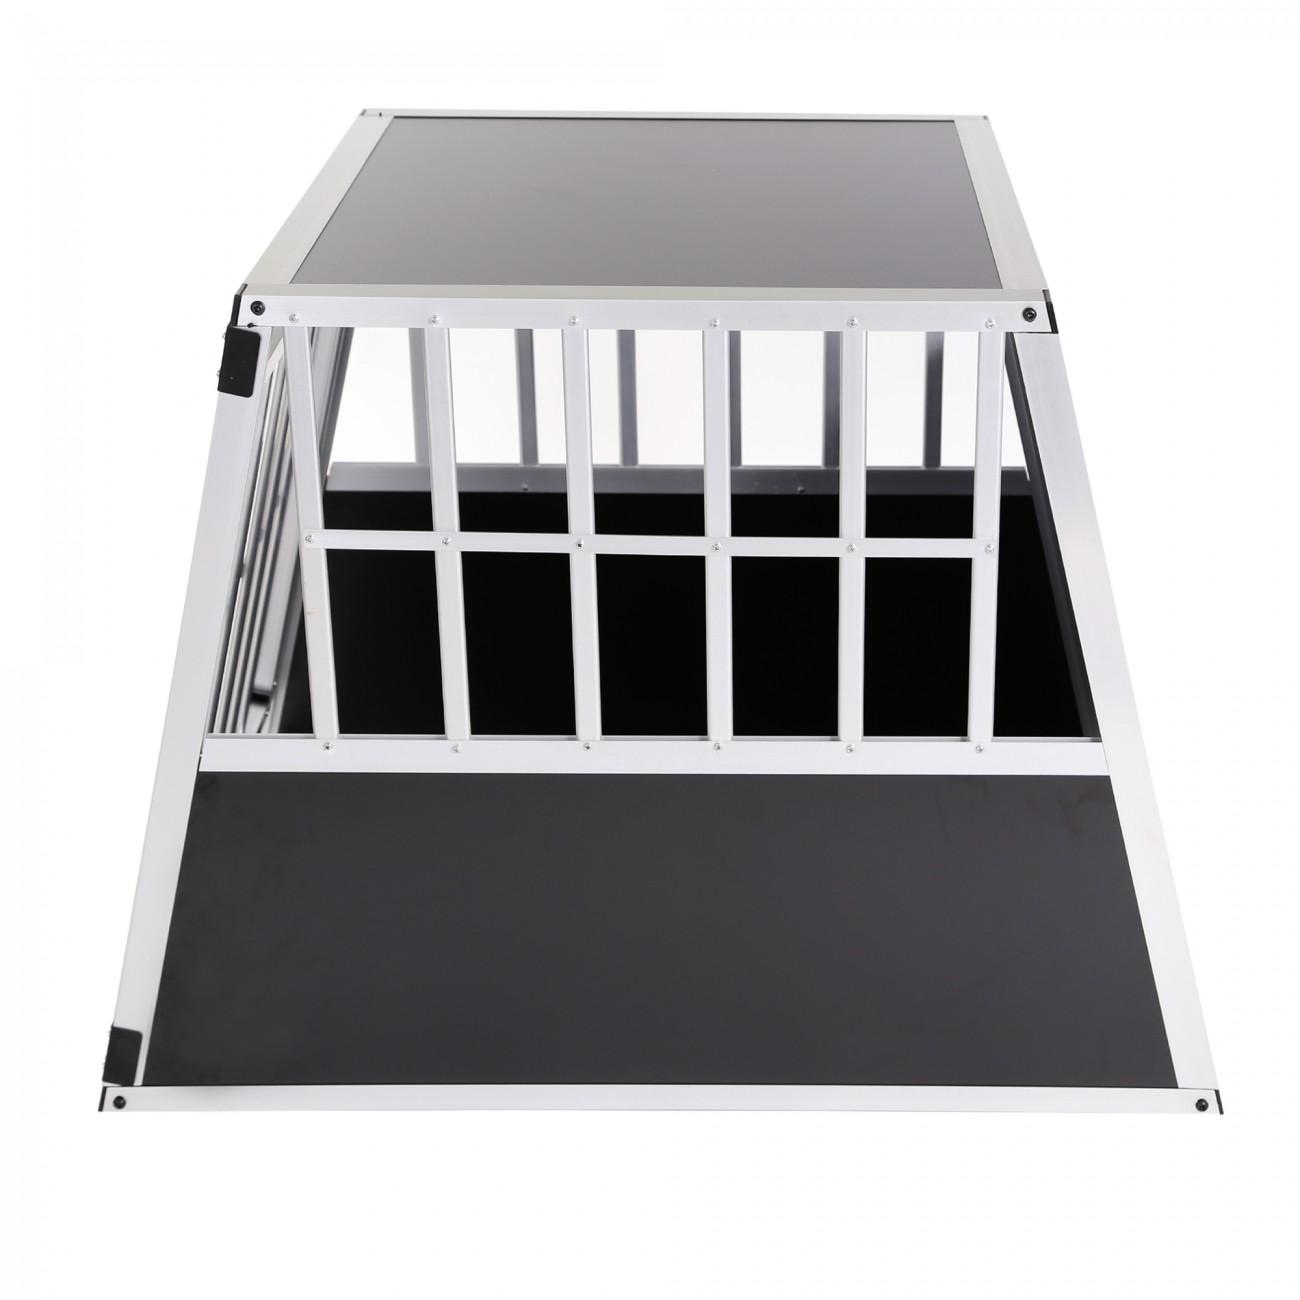 aluminium hundetransportbox transportbox alubox reisebox. Black Bedroom Furniture Sets. Home Design Ideas